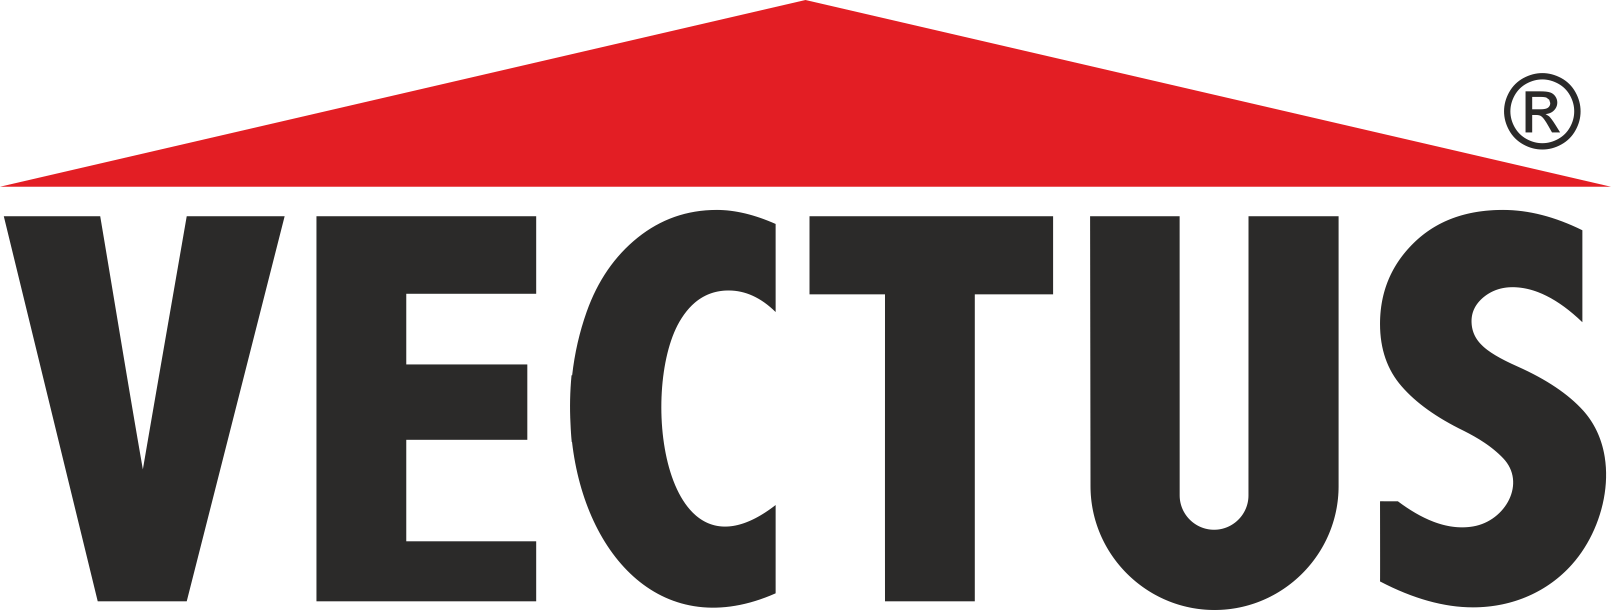 Vectus Logo mtime20200428143416